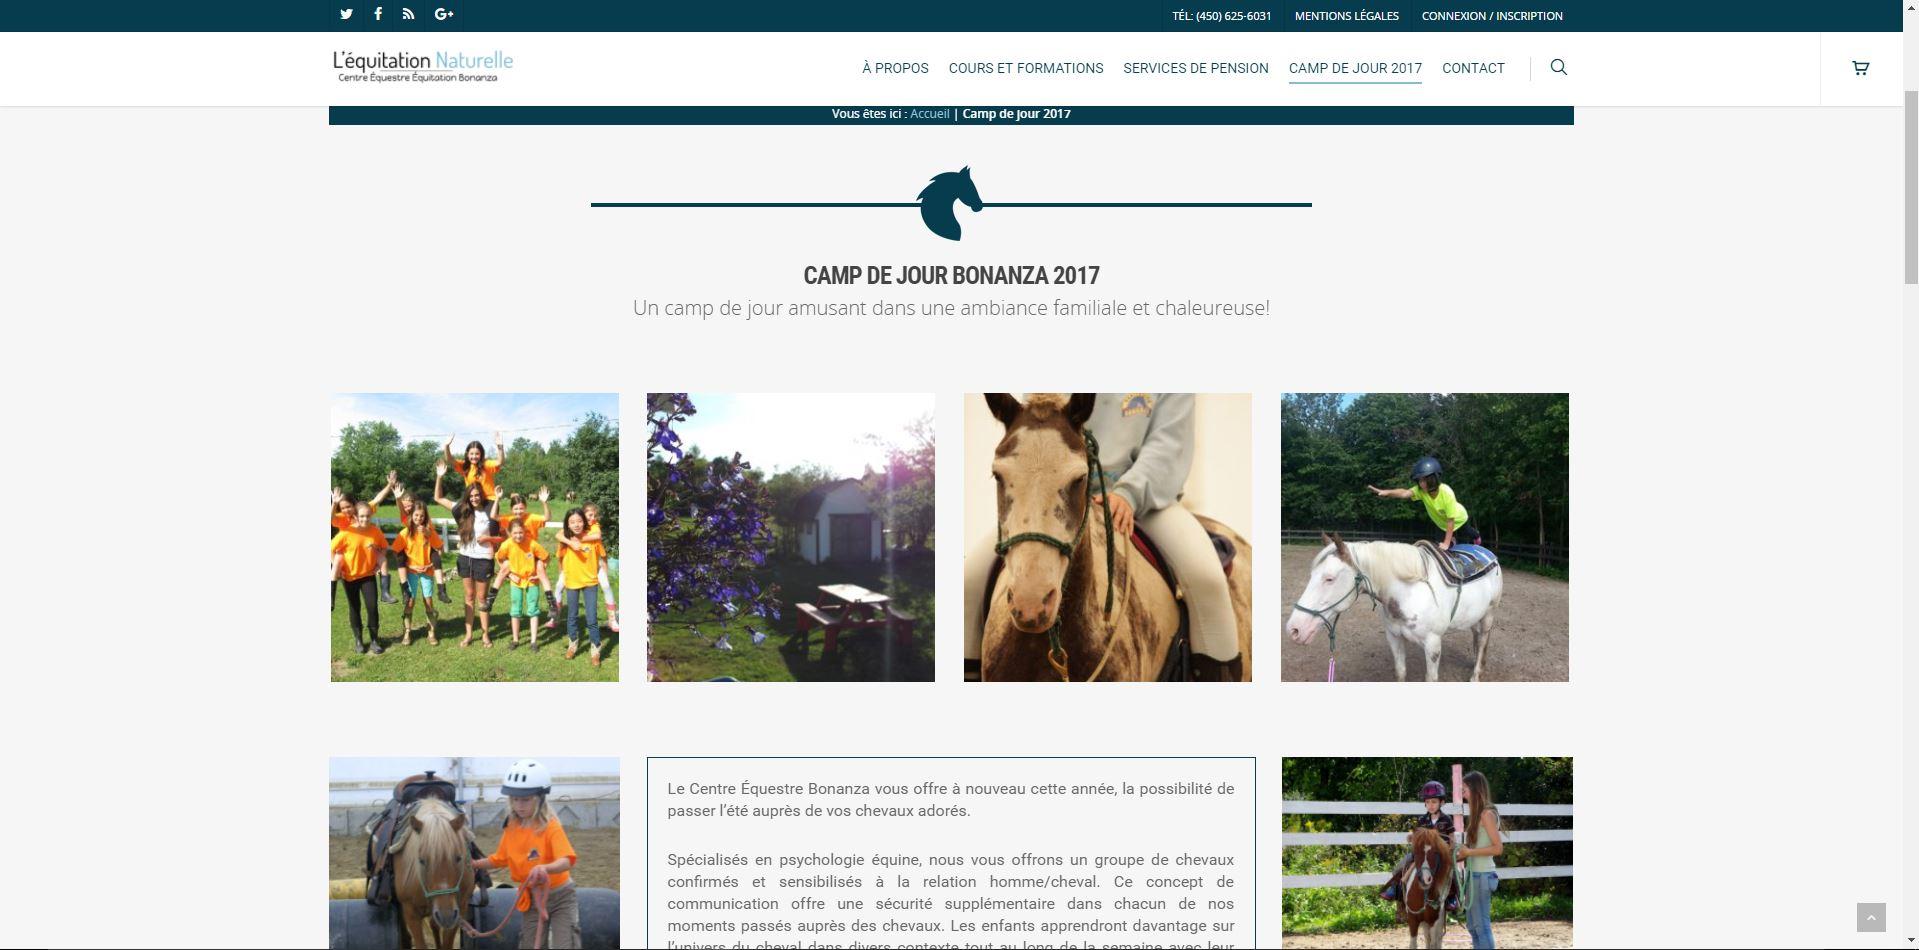 Agence web - Marketing digital - création site web - Protai-in -equitation bonanza